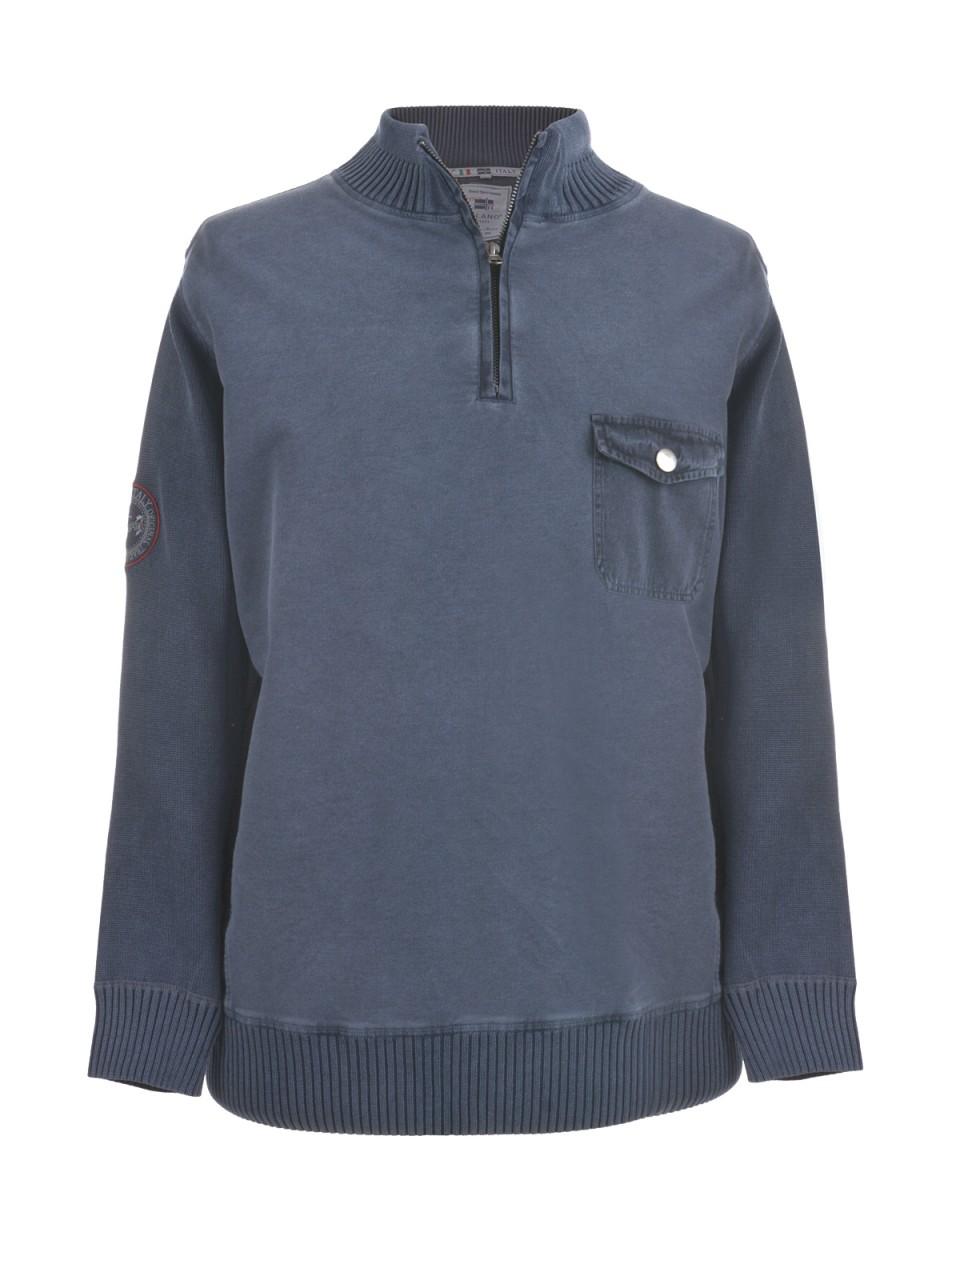 milano-italy-herren-pullover-navy